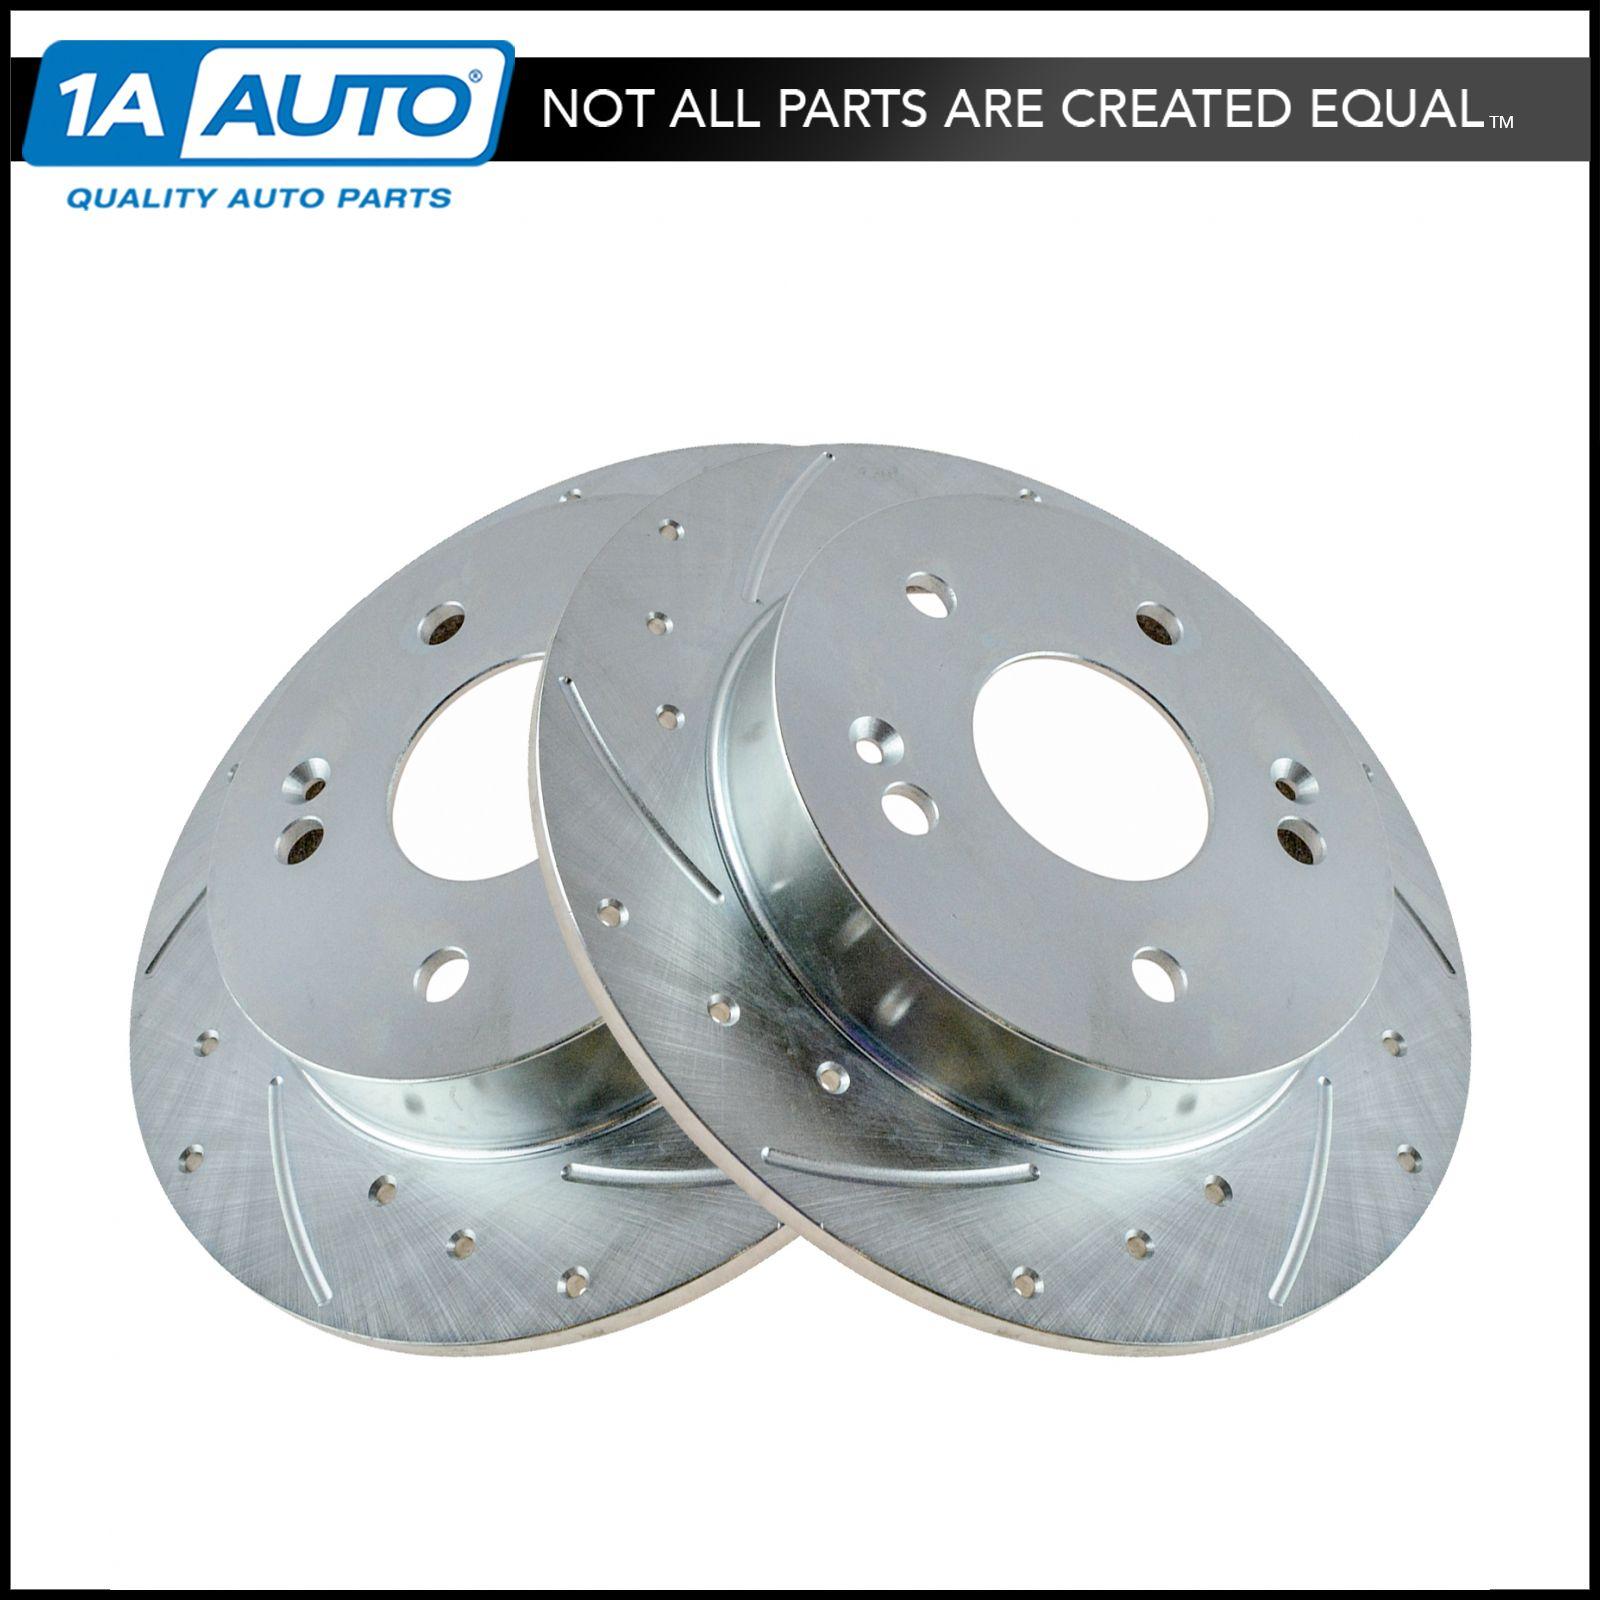 Rear Cross-Drilled Slotted Brake Rotors and Ceramic Brake Pads BLCR.63051.02